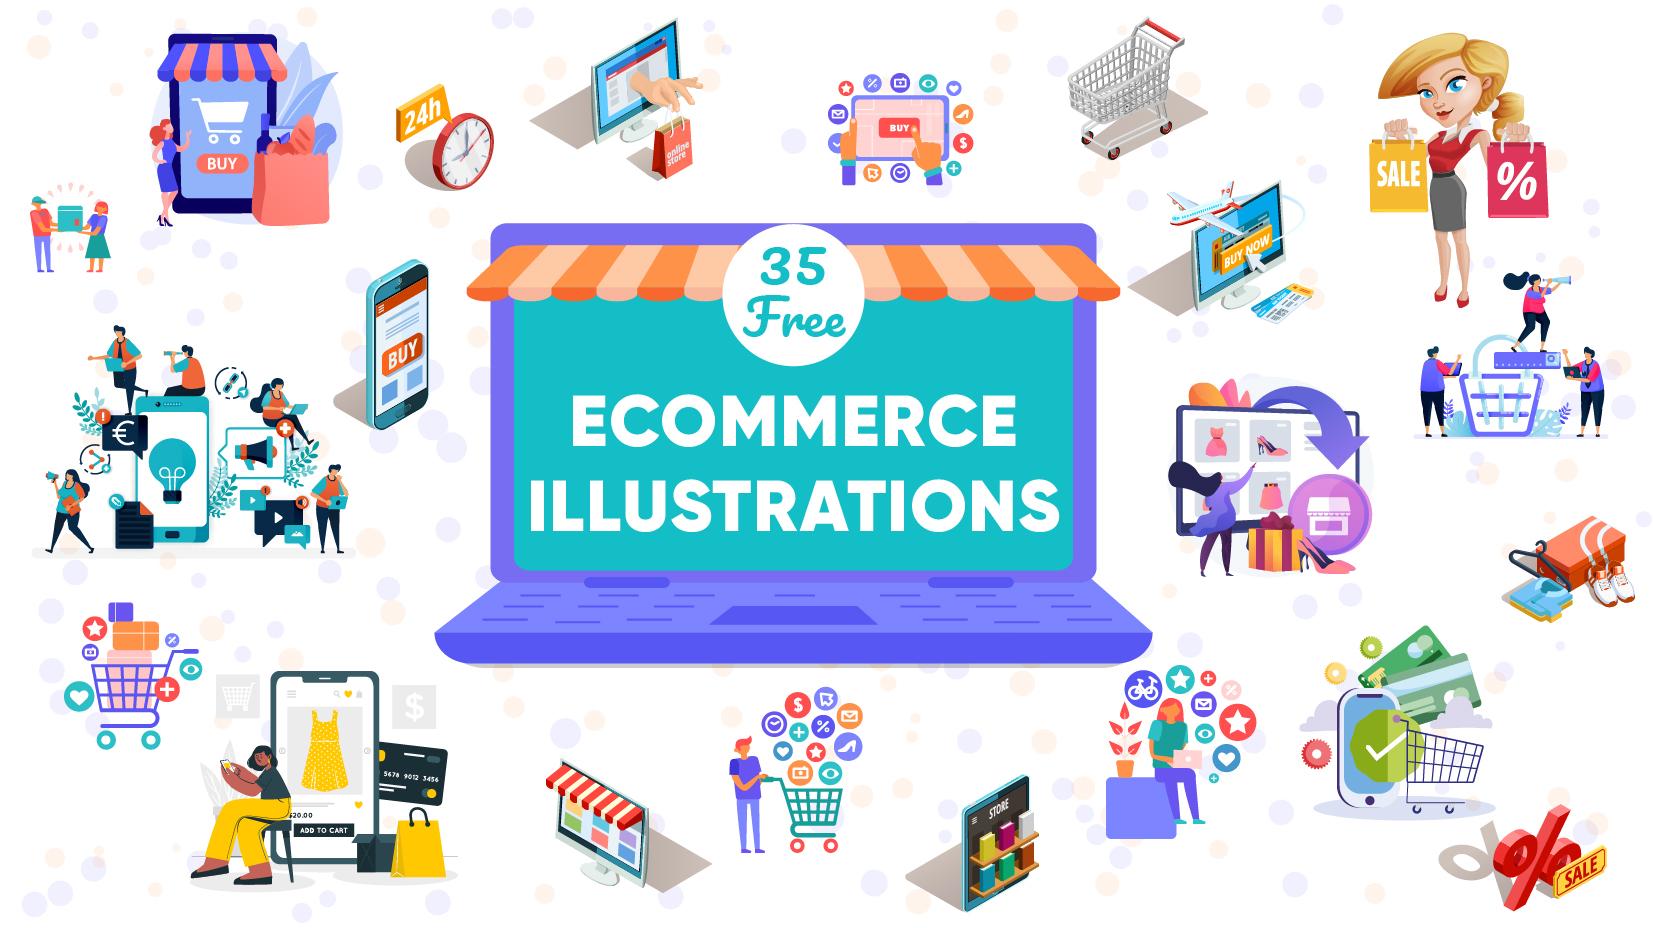 35 Free Ecommerce Illustrations